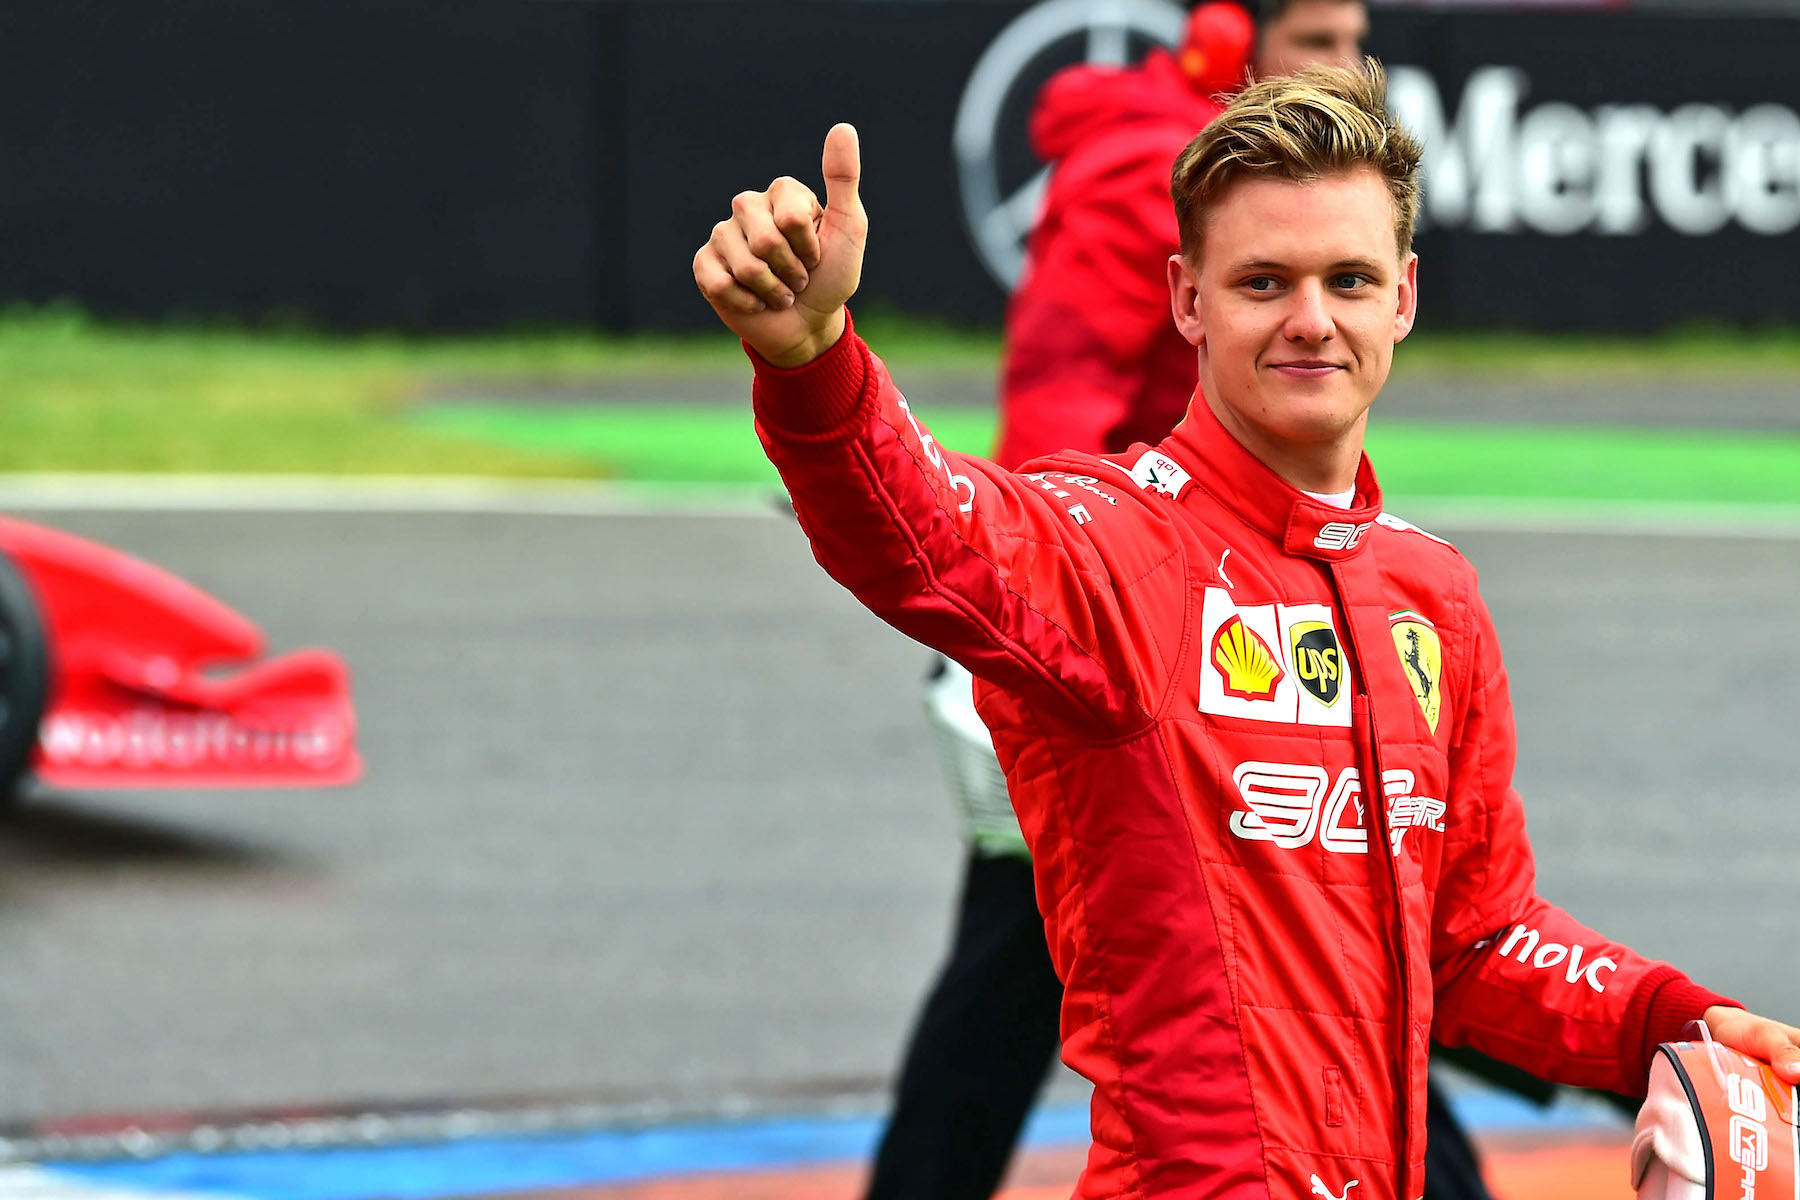 2019 Mick Schumacher | Ferrari F2004 | 2019 German GP 16 copy.jpg